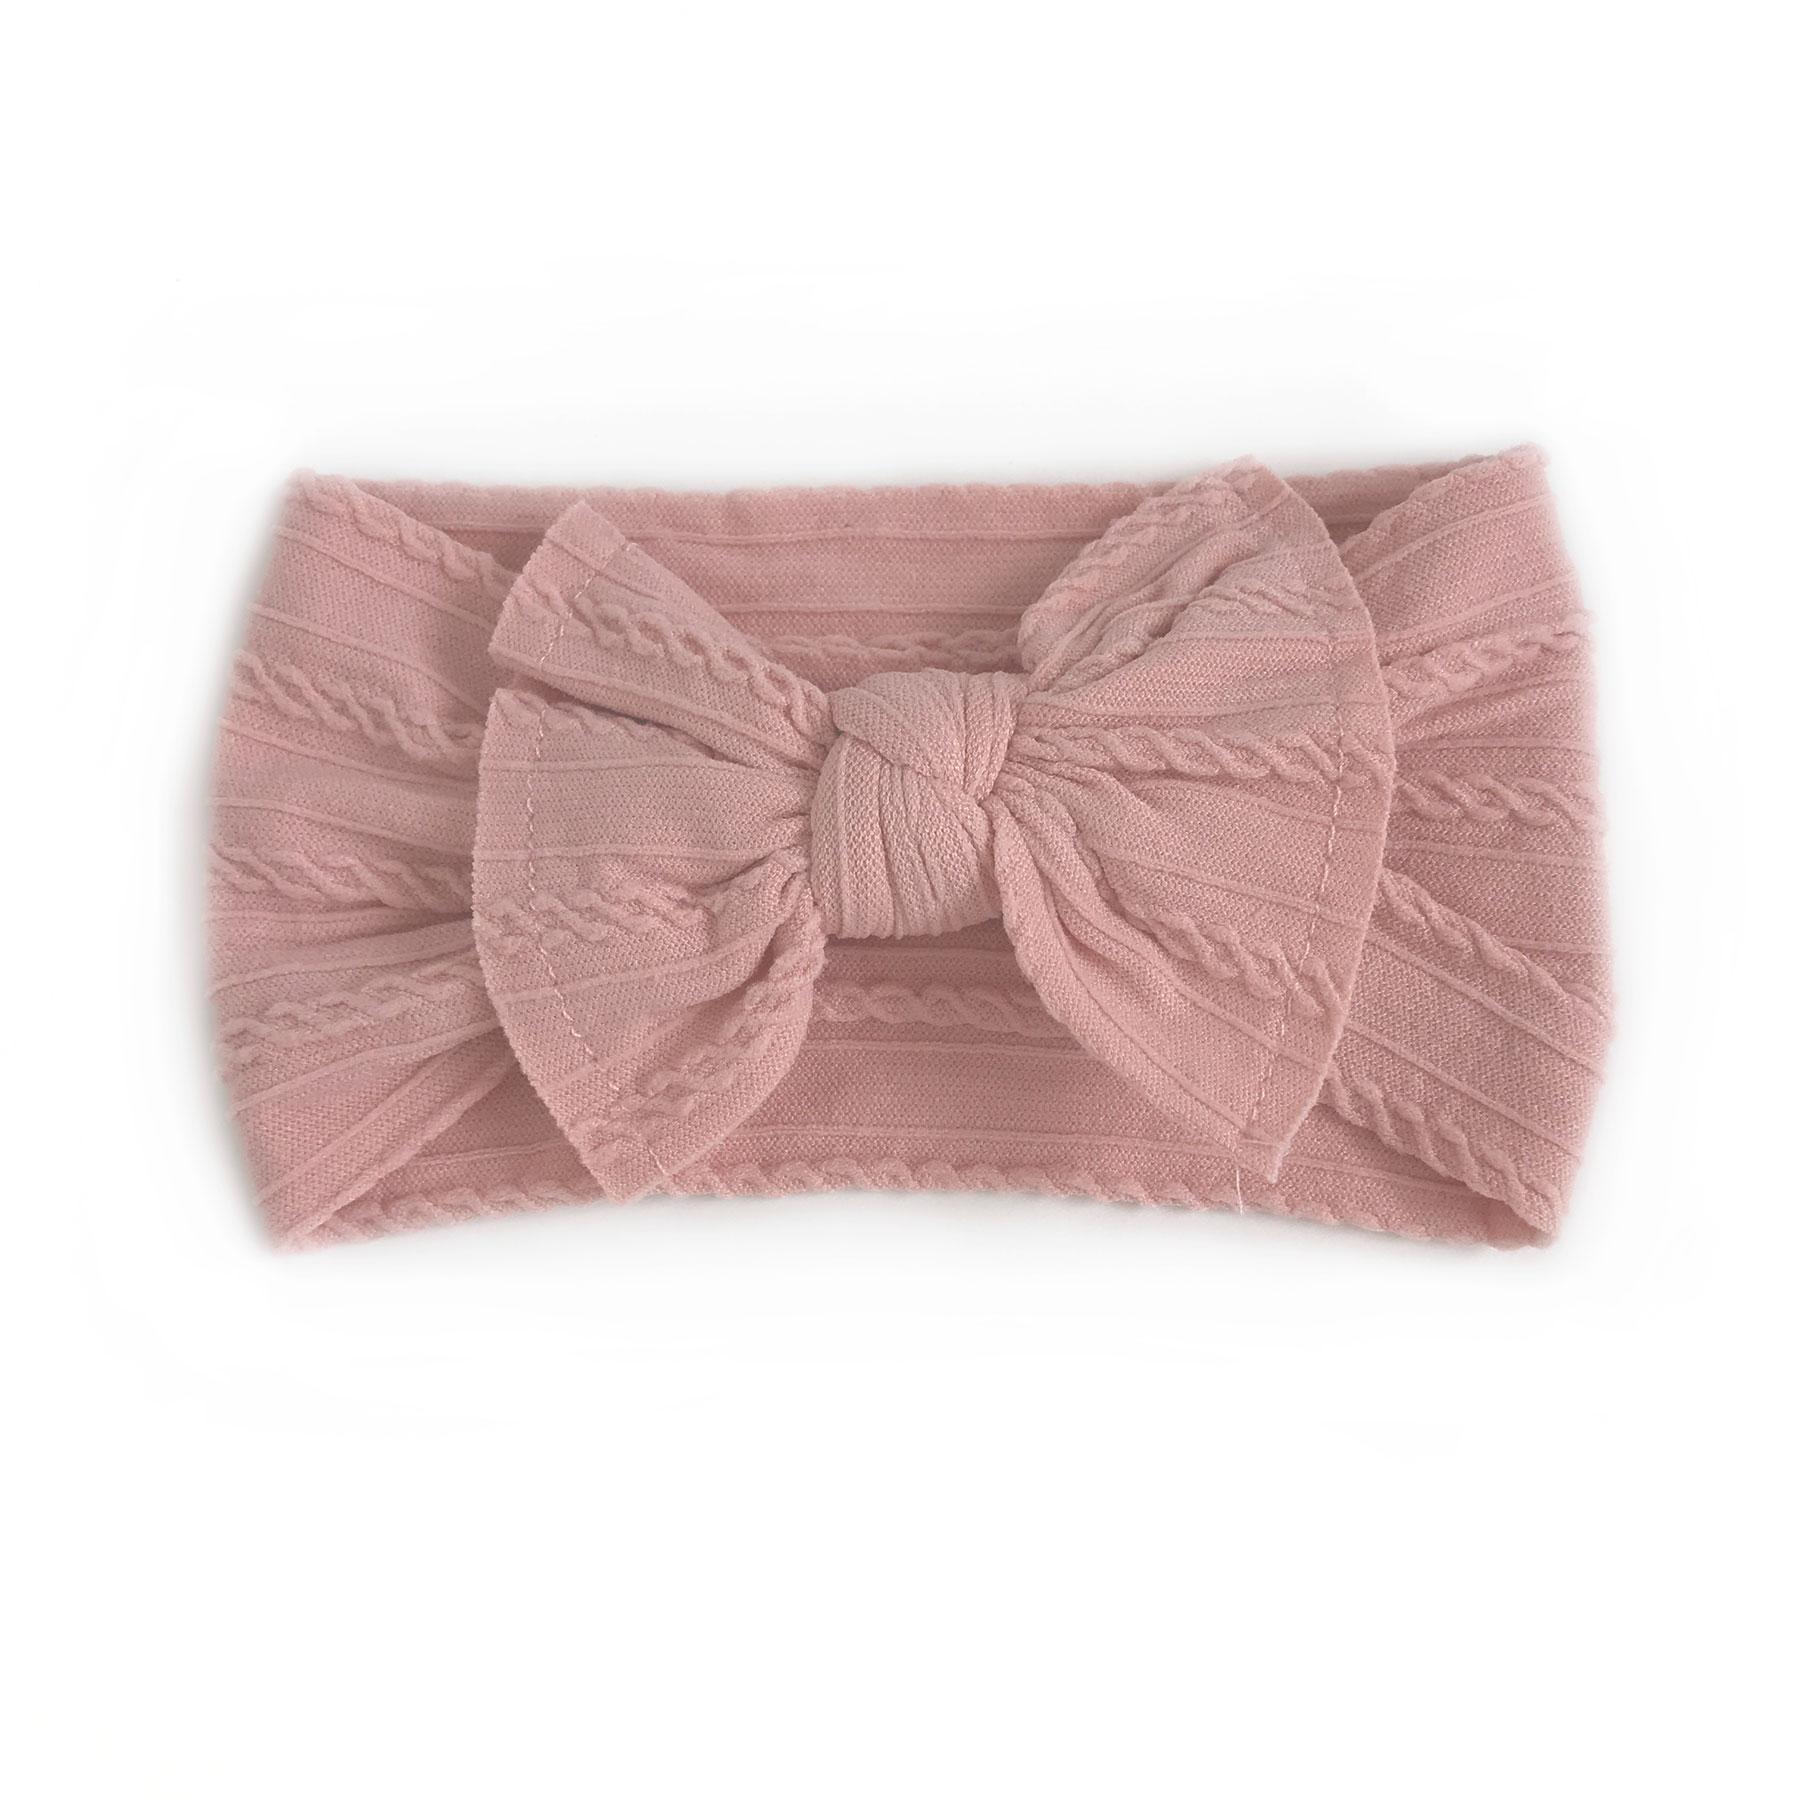 Ophelia Dusty Pink Stretch Headband